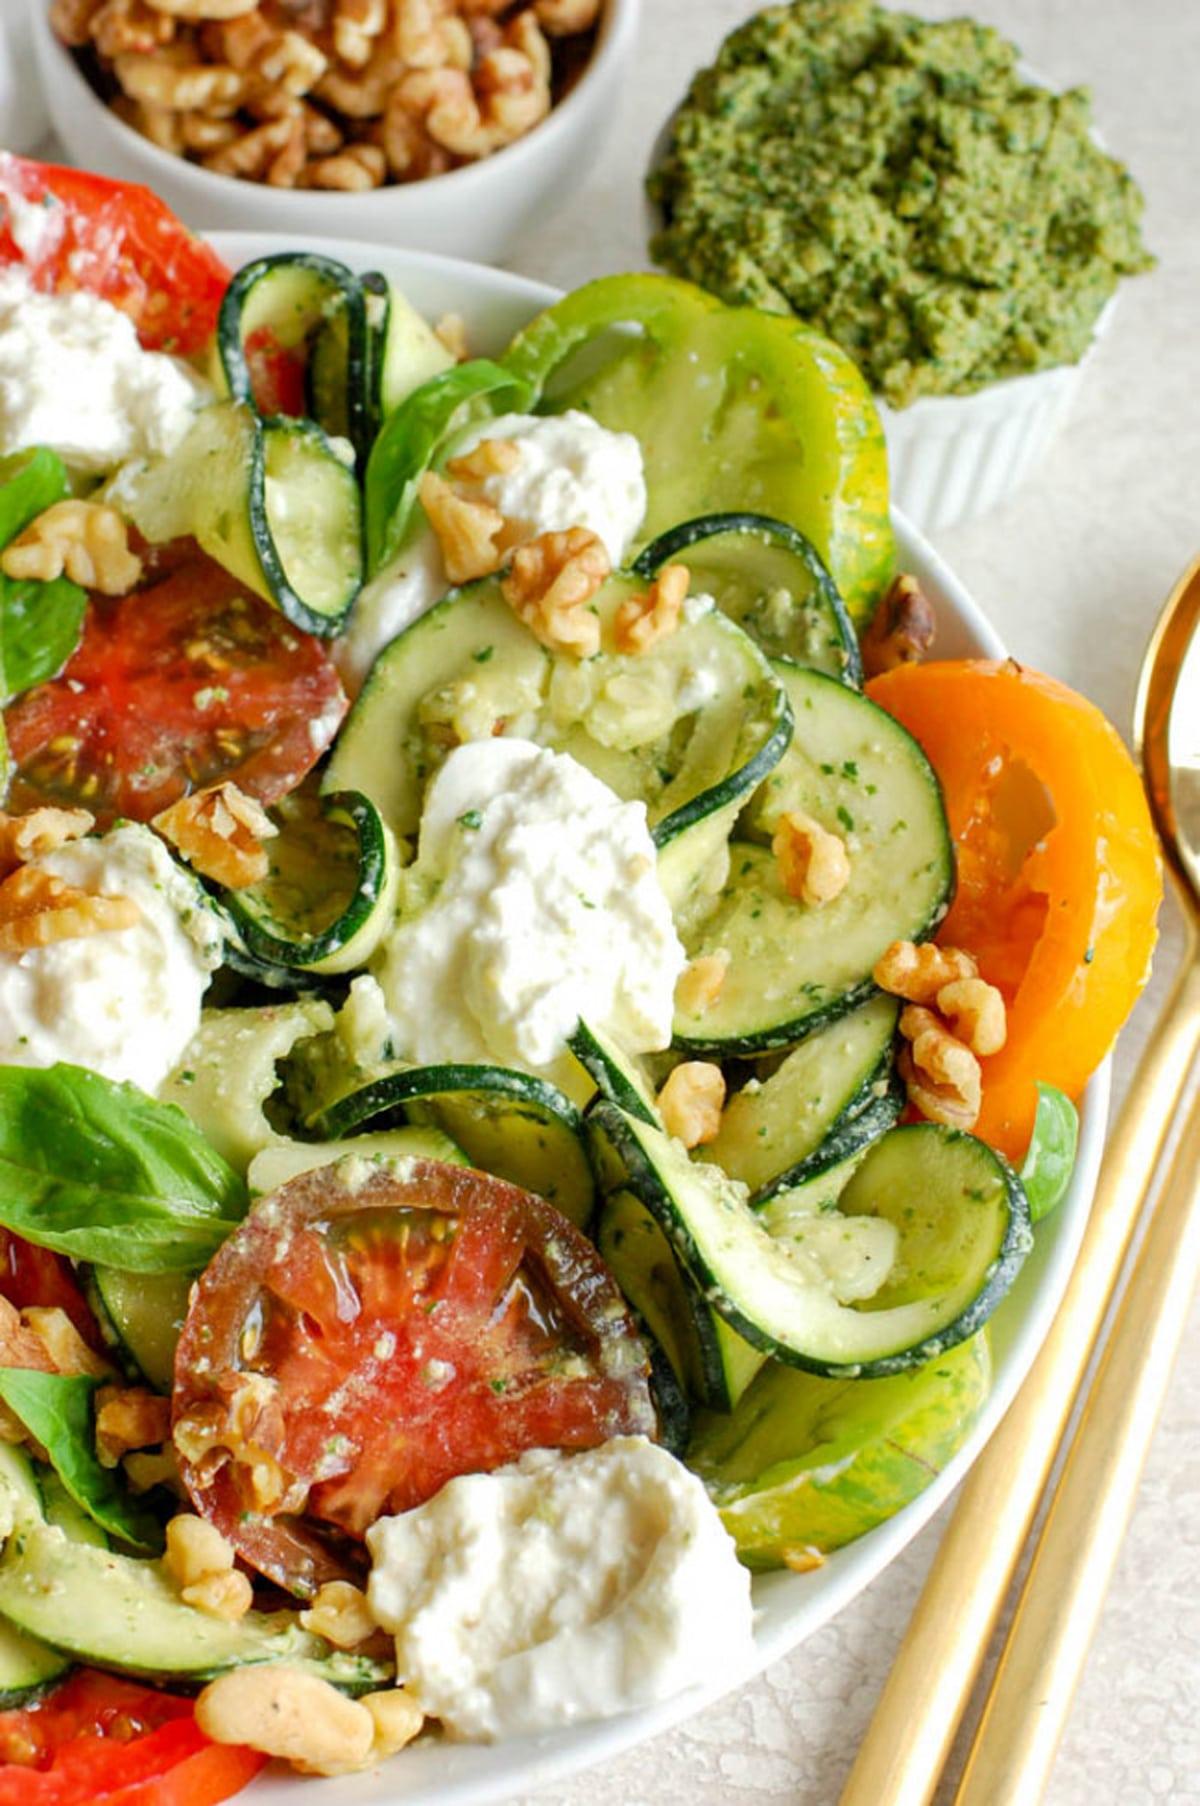 Caprese Salad covered in a pesto sauce.